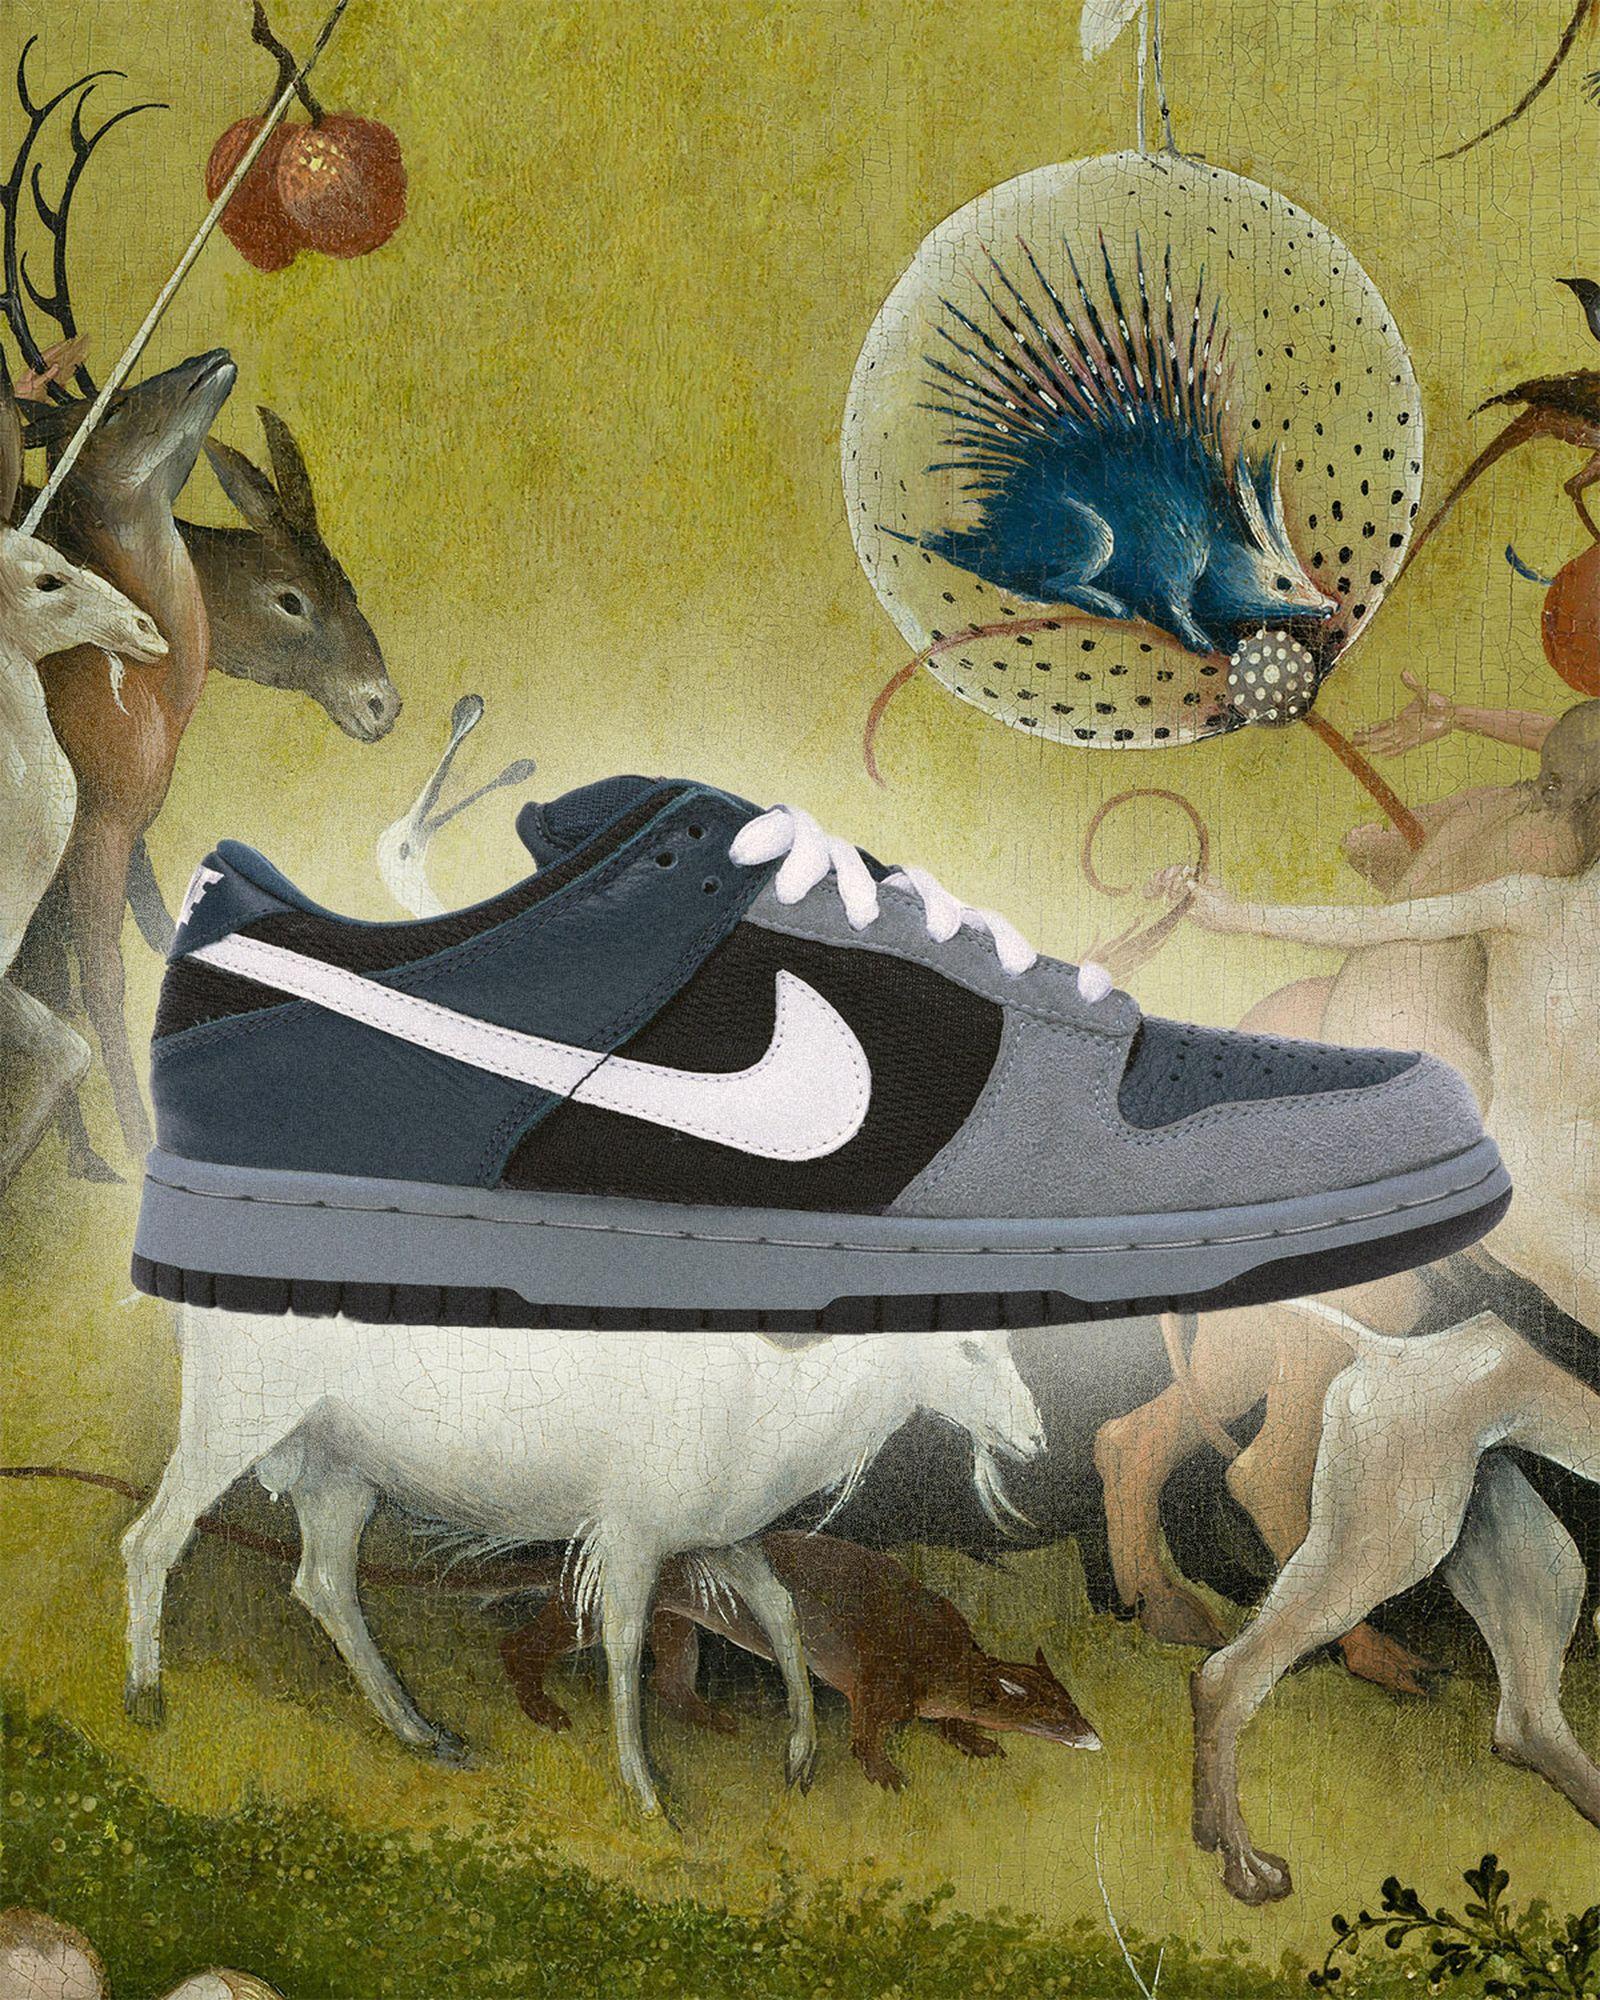 Nike-Dunk-Low-Pro-SB-Futura